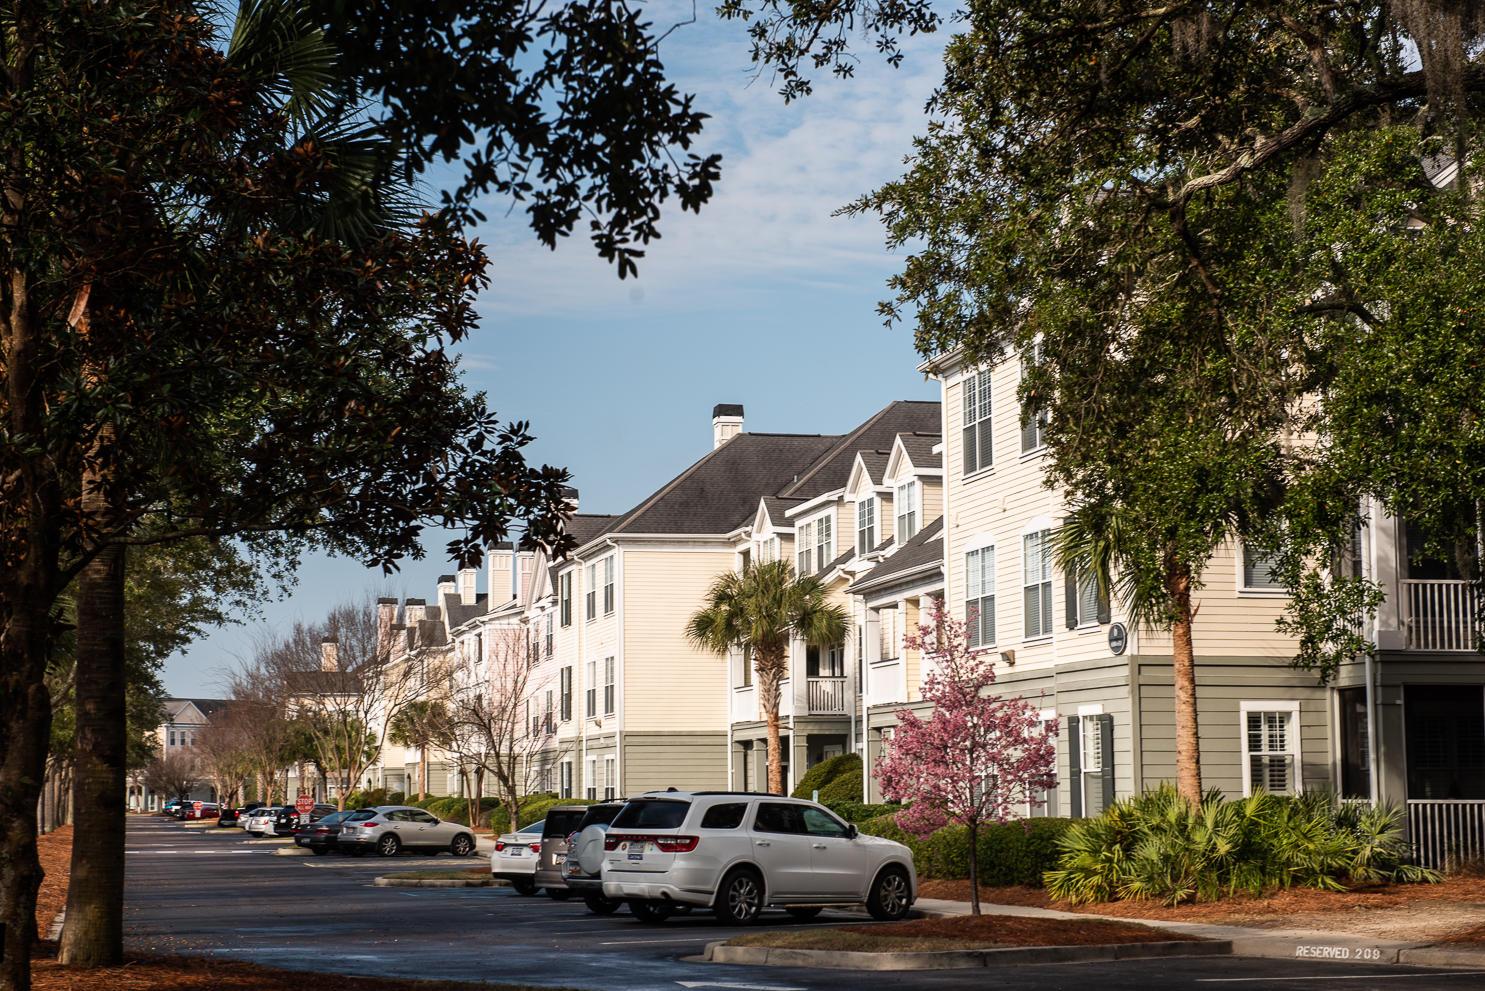 Daniel Landing Condos Homes For Sale - 130 River Landing, Charleston, SC - 12